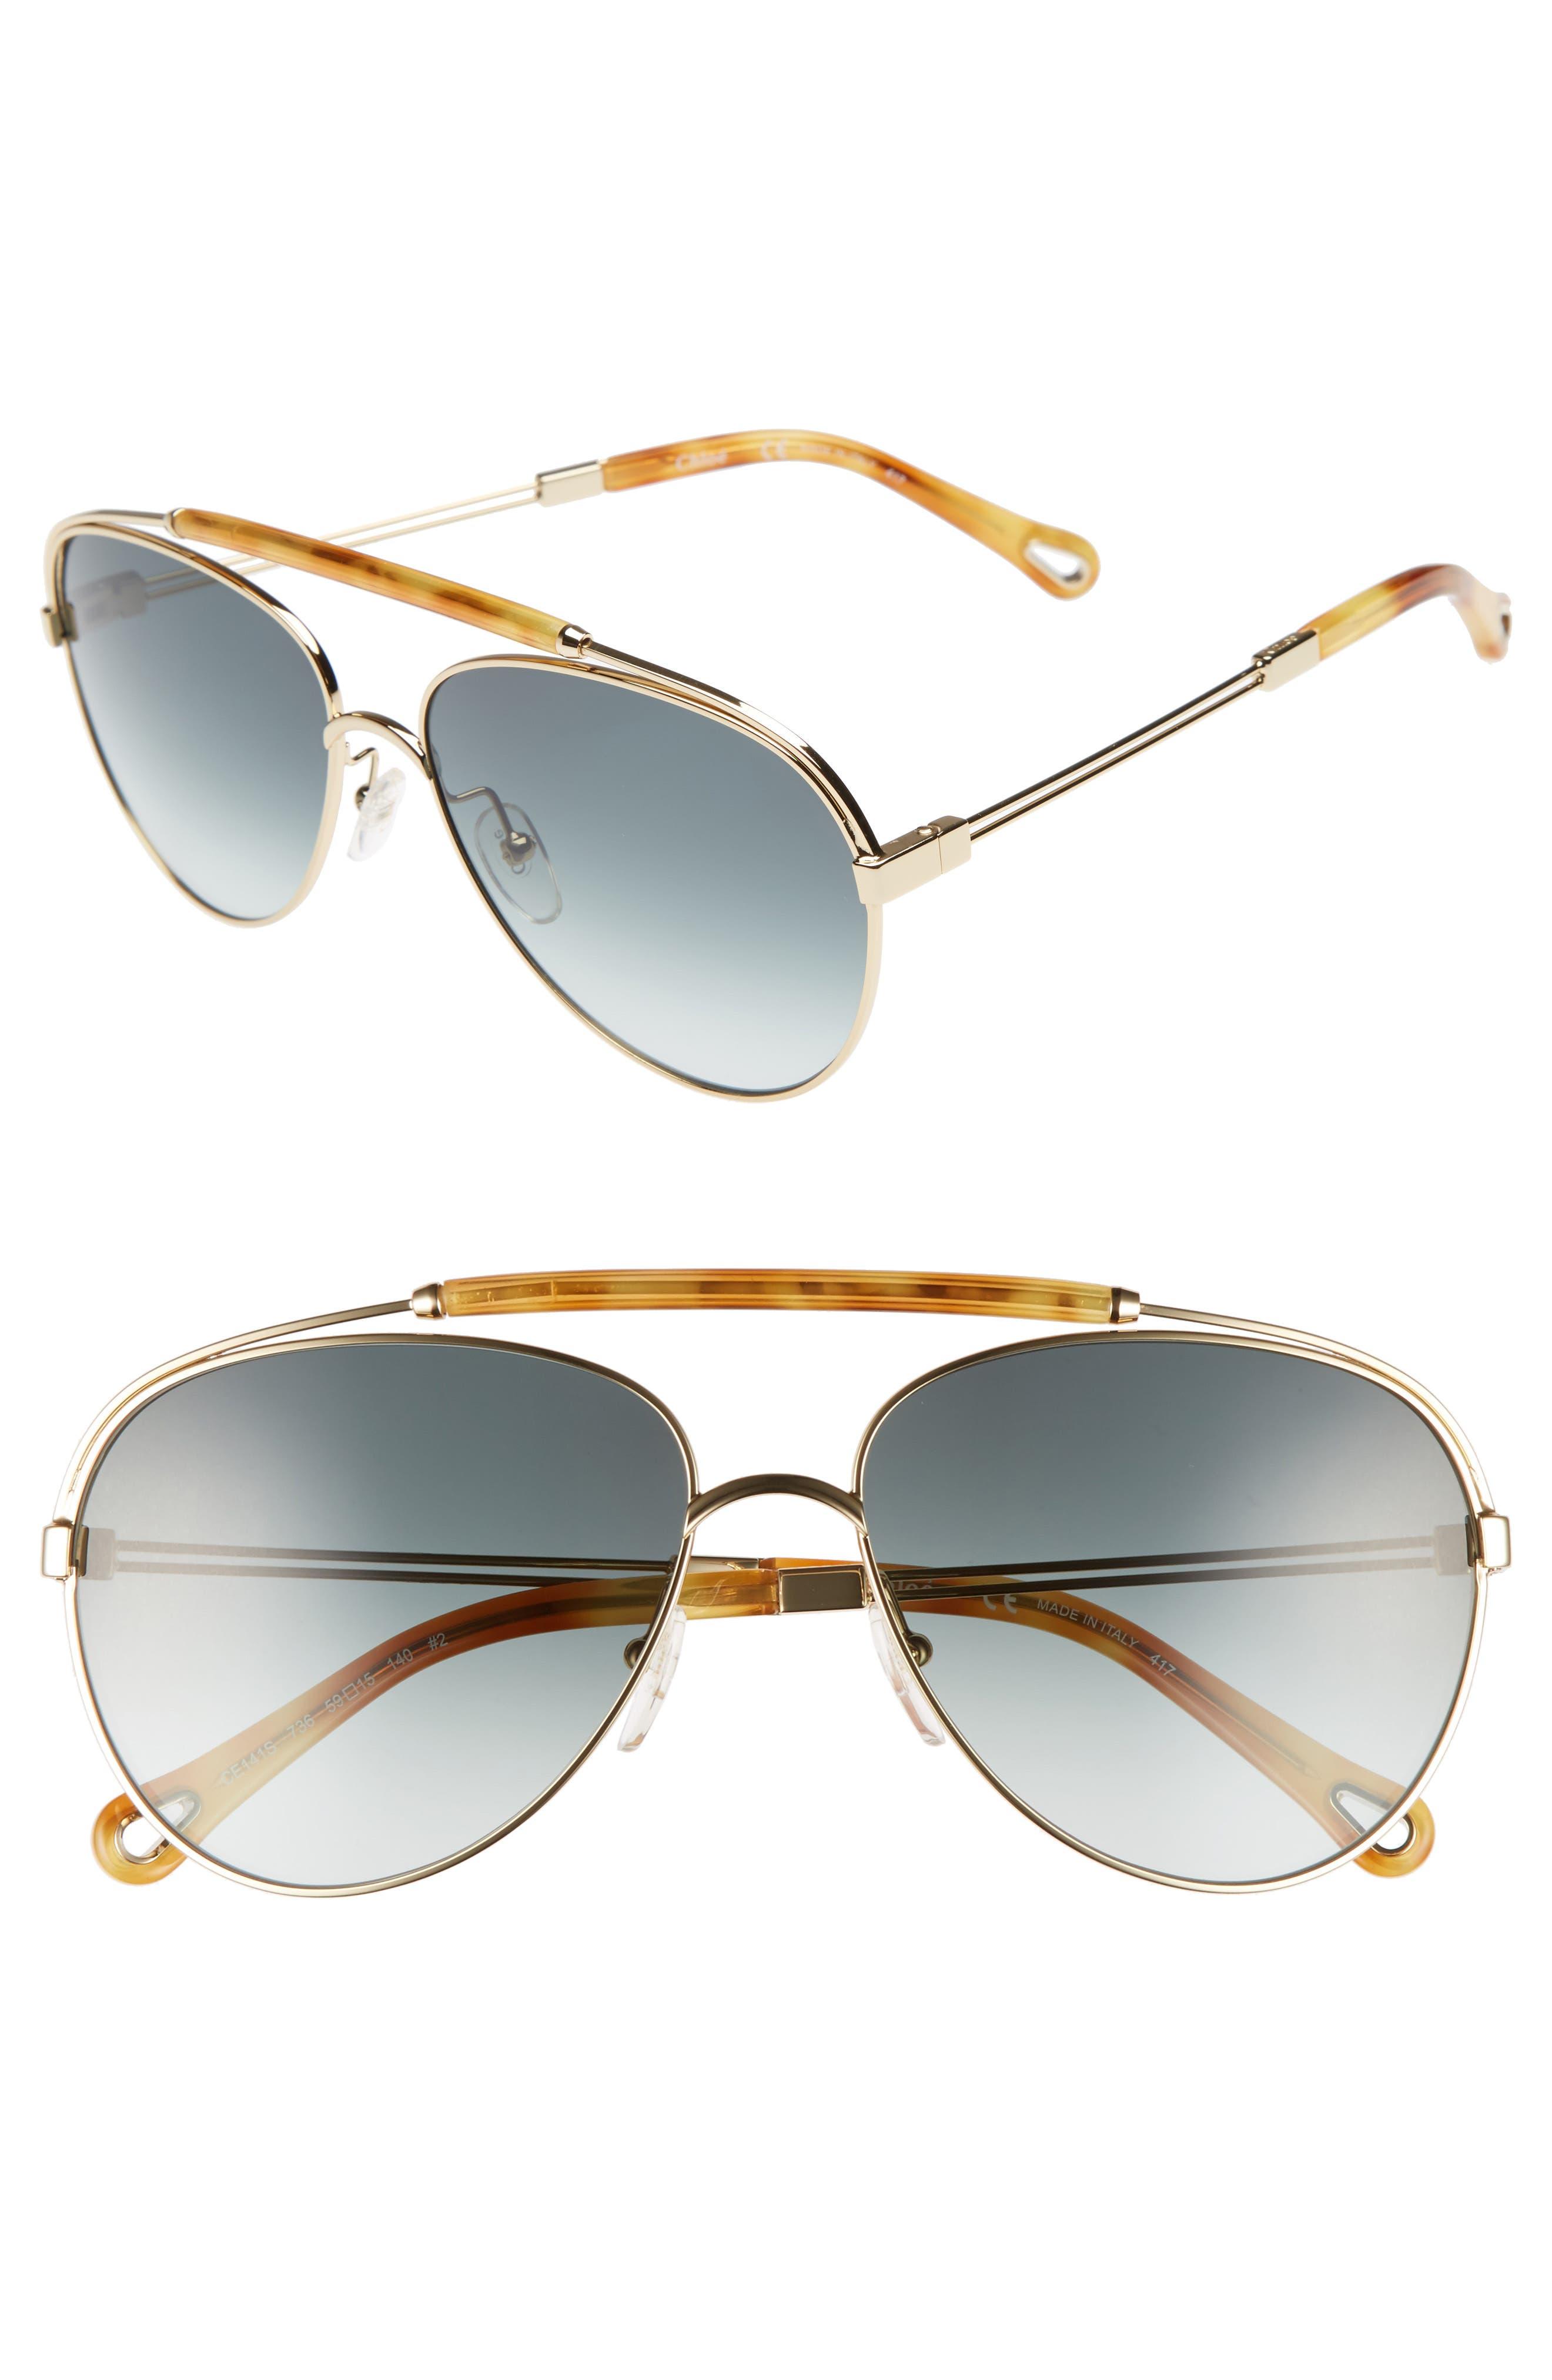 Jackie 59mm Aviator Sunglasses,                         Main,                         color, GOLD/ BLONDE HAVANA